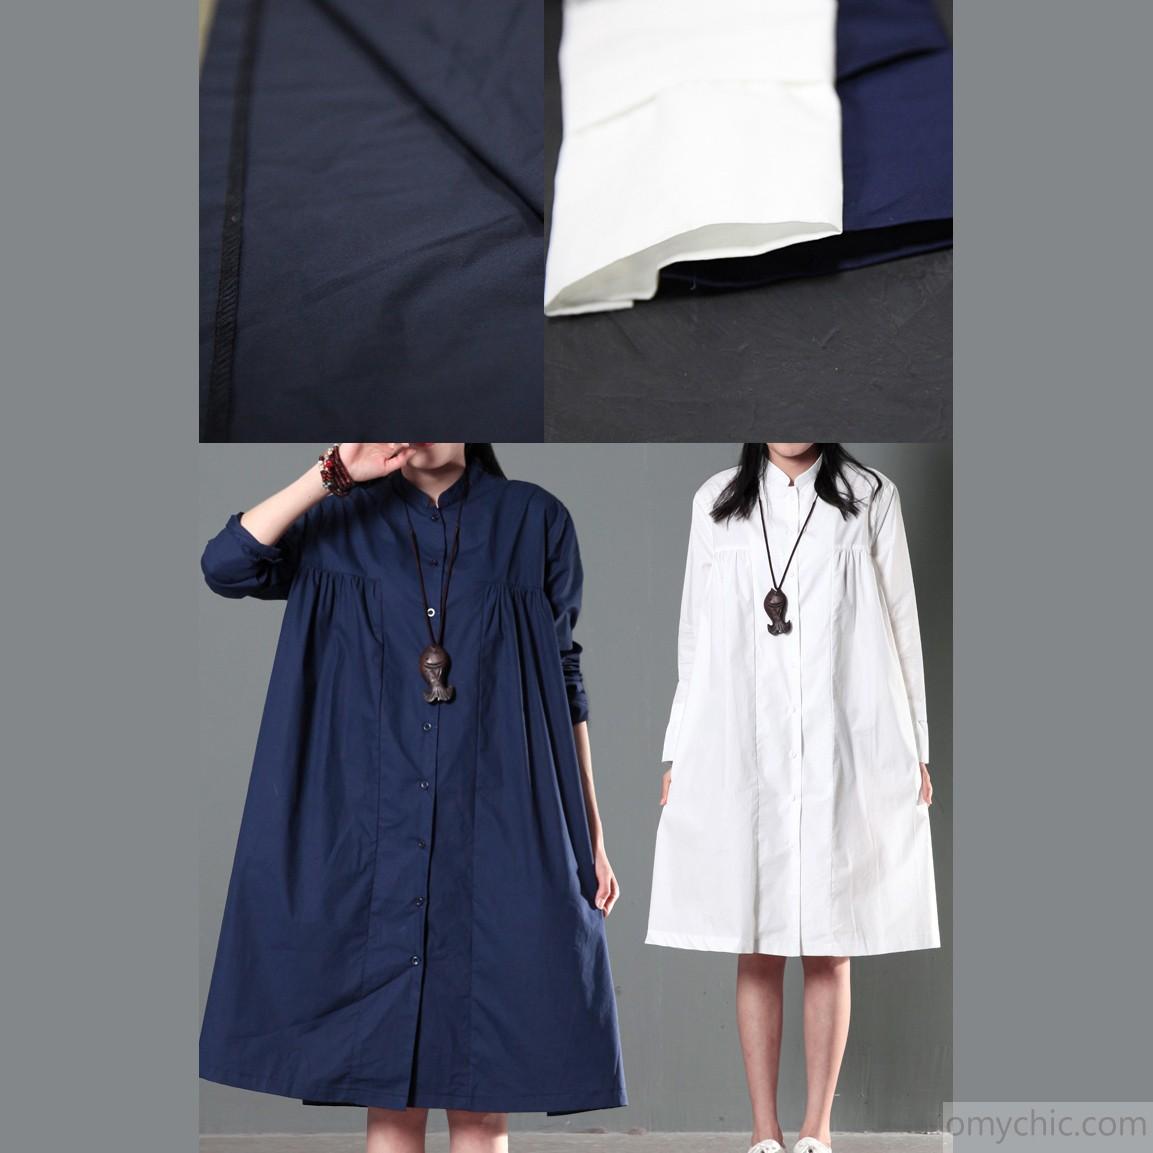 Plus Size Maternity Dresses for Baby Shower | Maternity Sundress | Kohls Summer Clothes